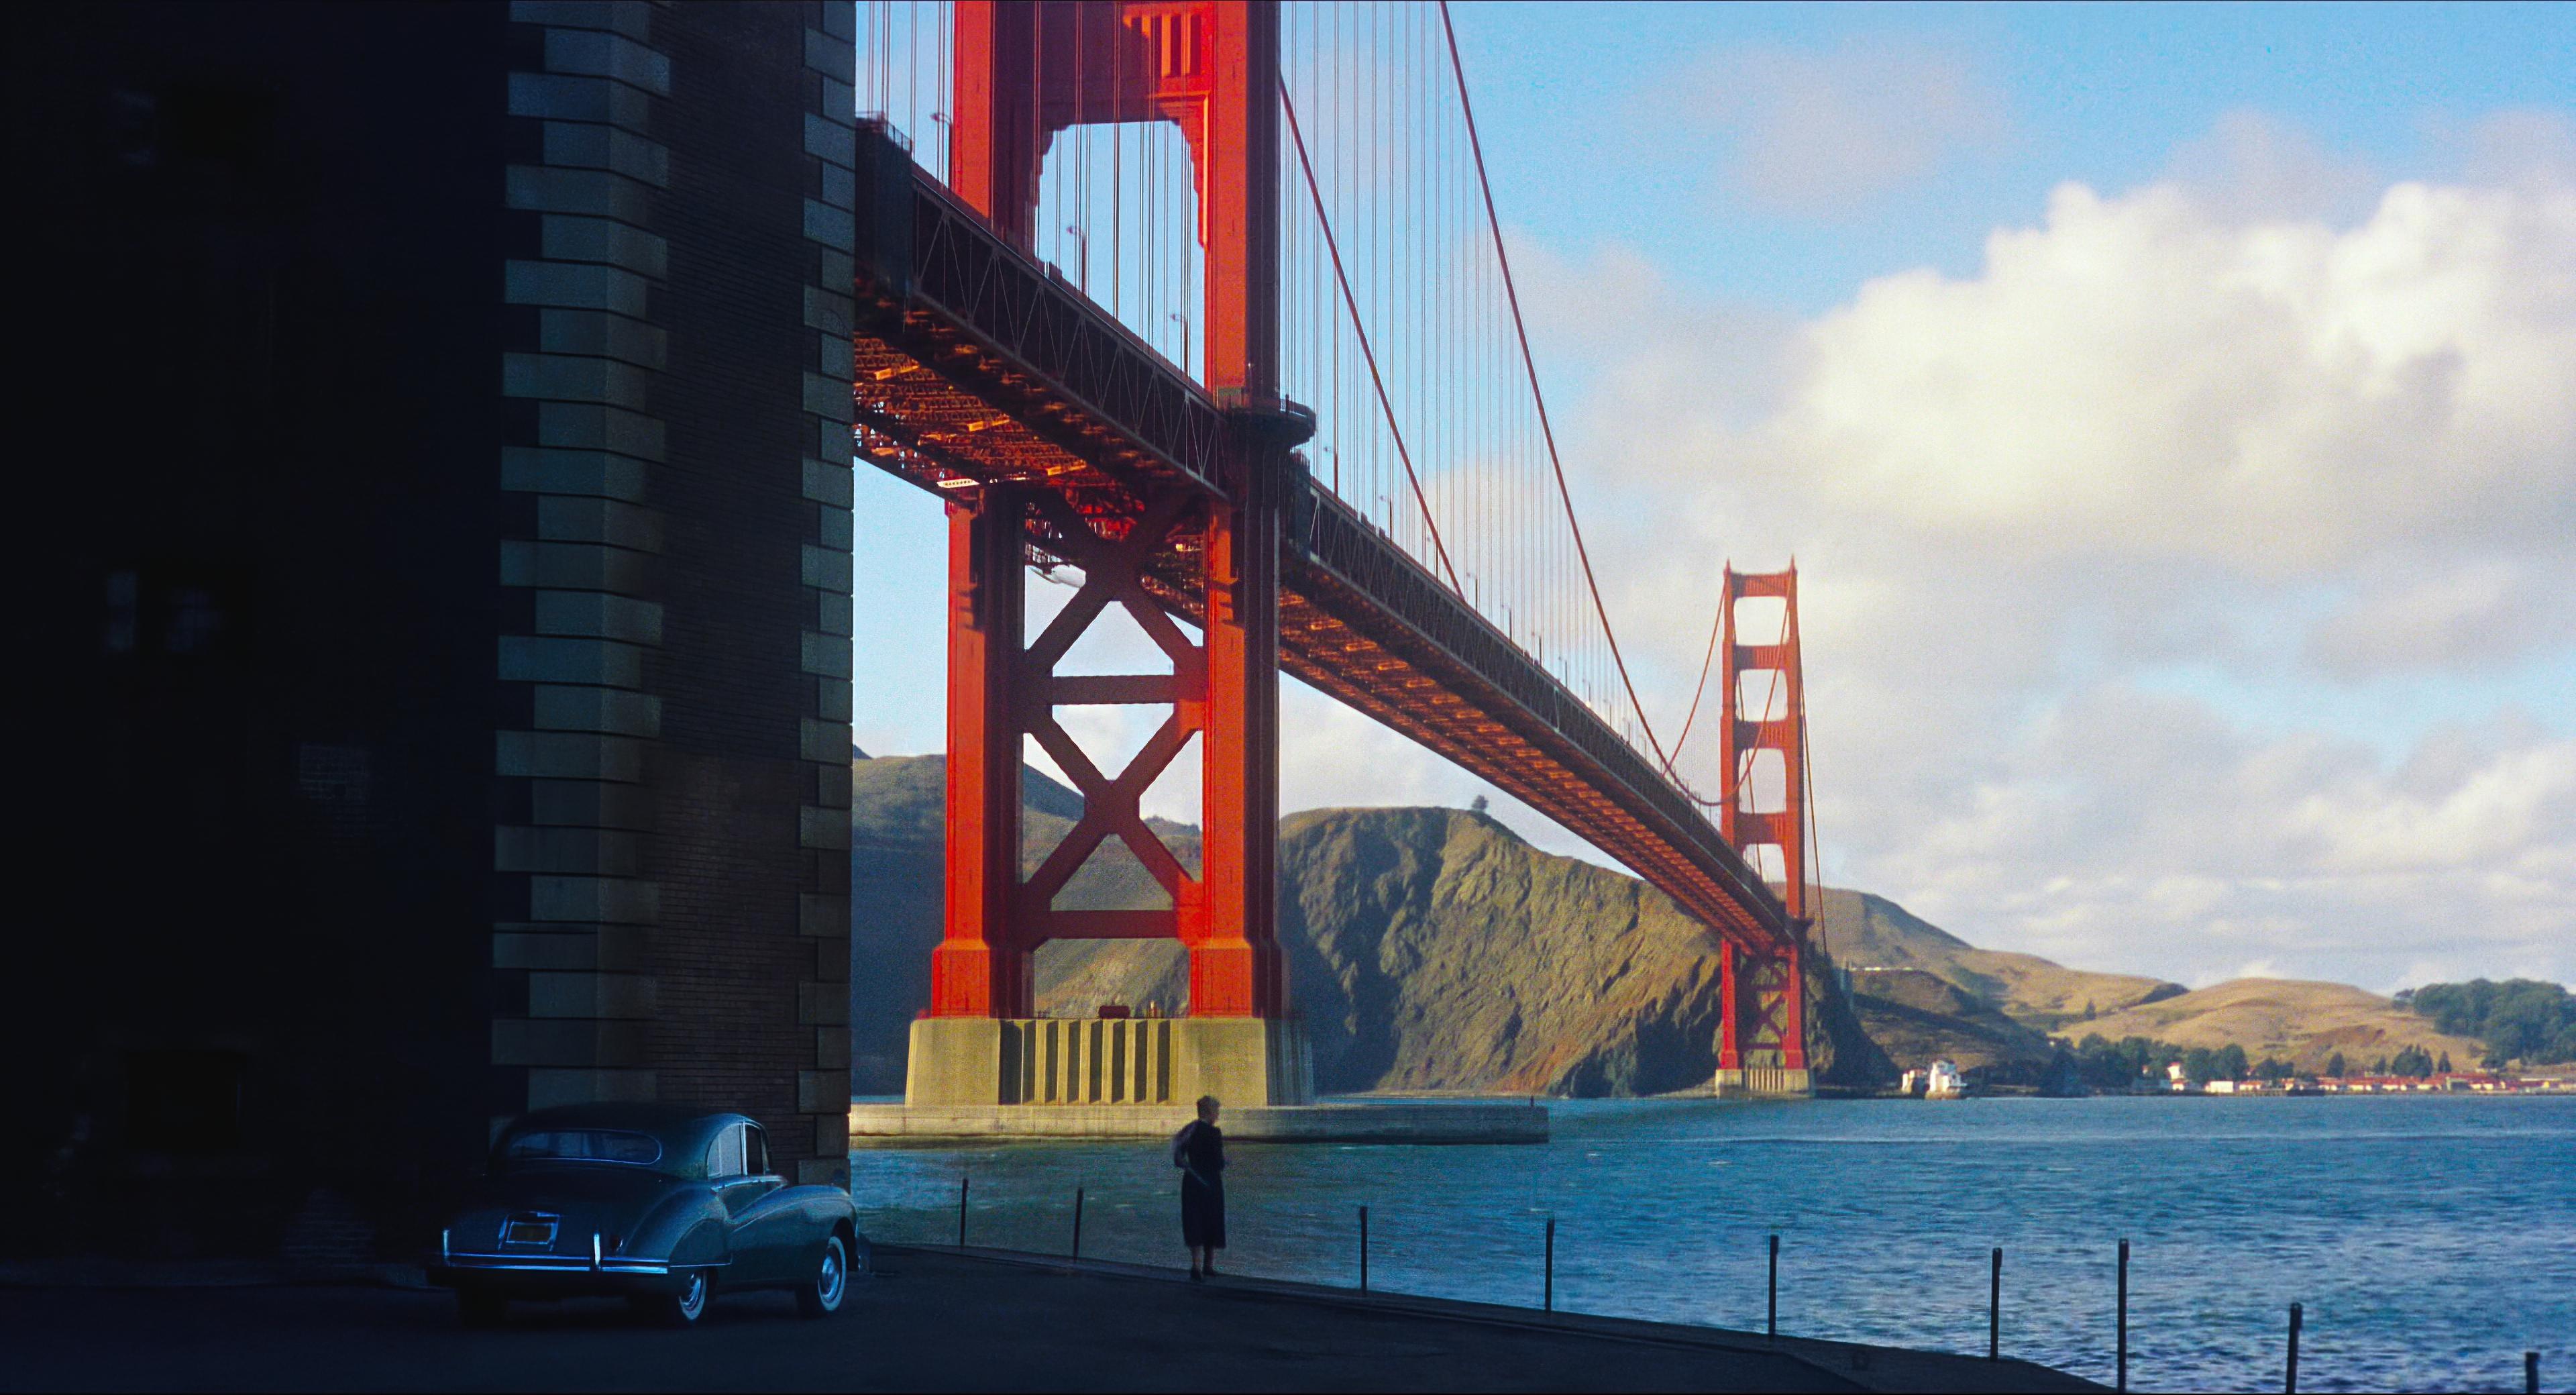 filevertigo 1958 trailer kim novak at golden gate bridge